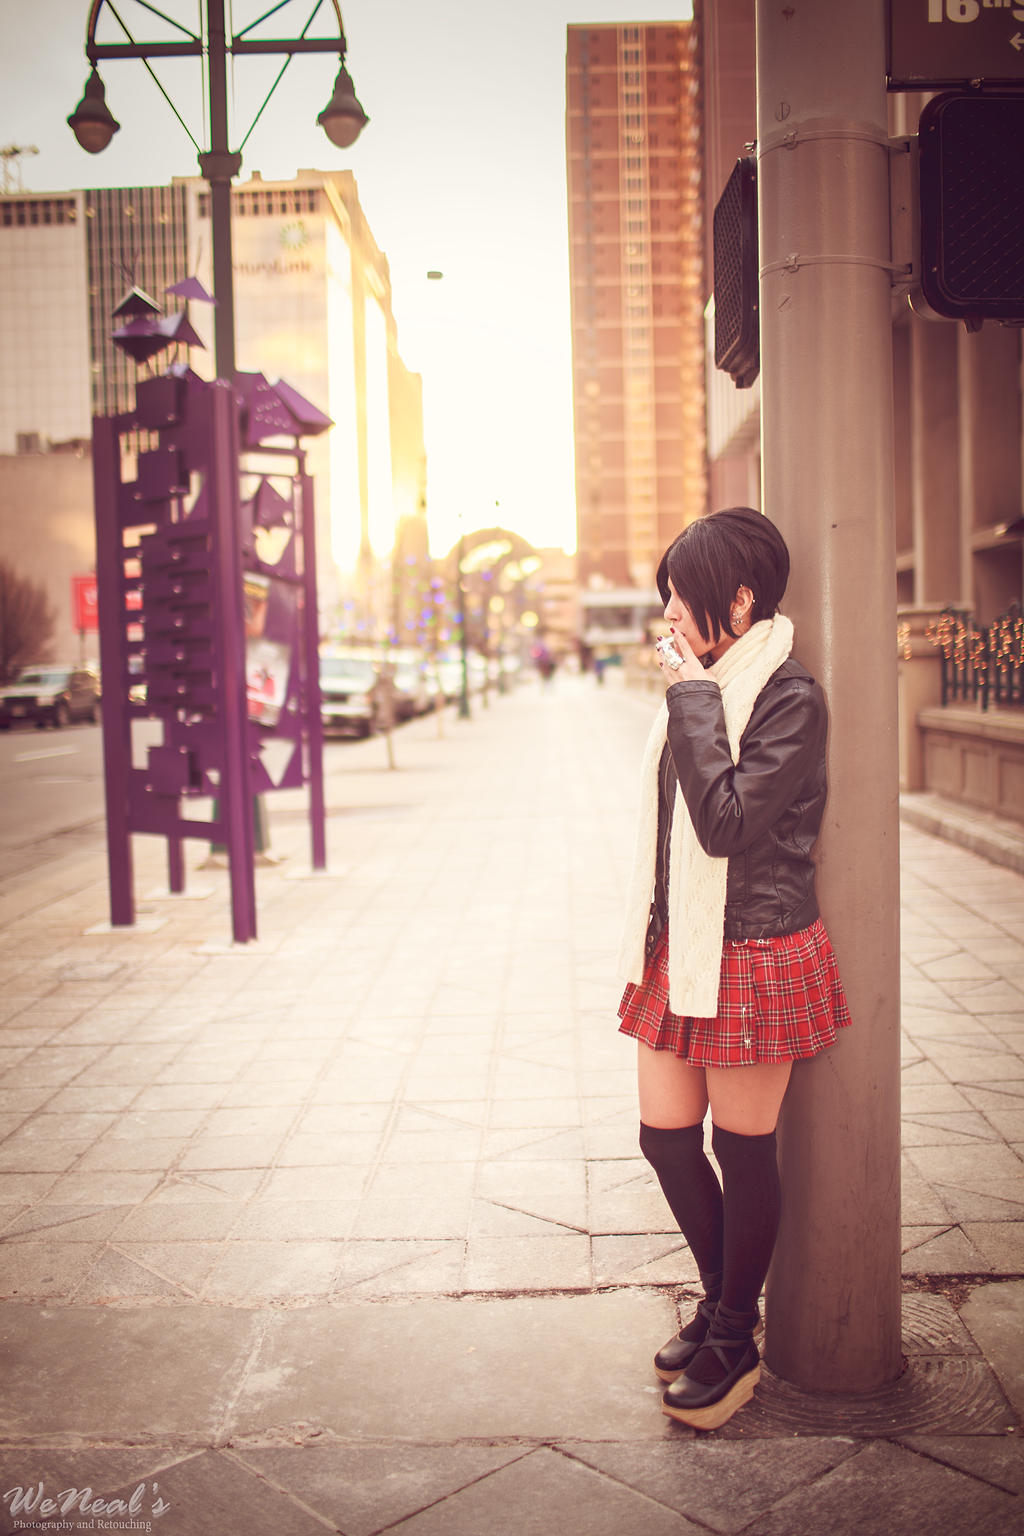 NANA on the corner by Torremitsu